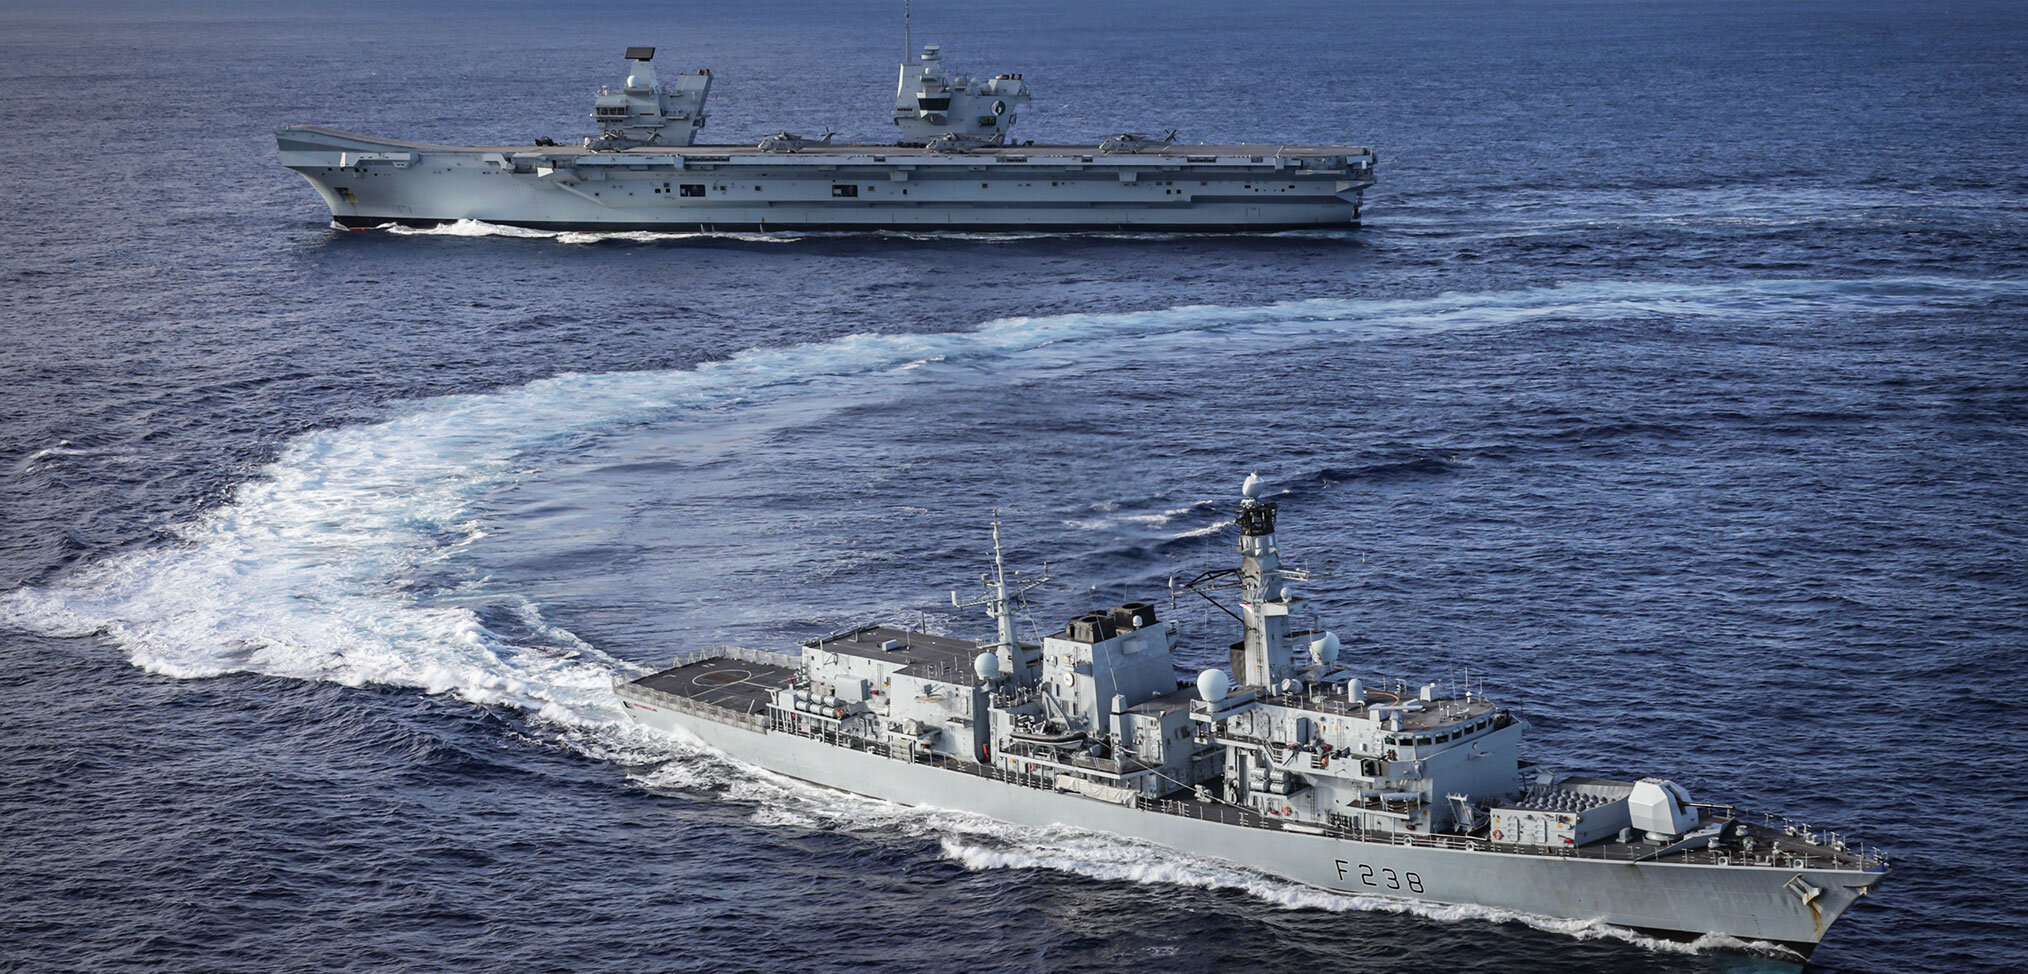 Photo essay: HMS Queen Elizabeth Westlant 19 deployment – Part 2